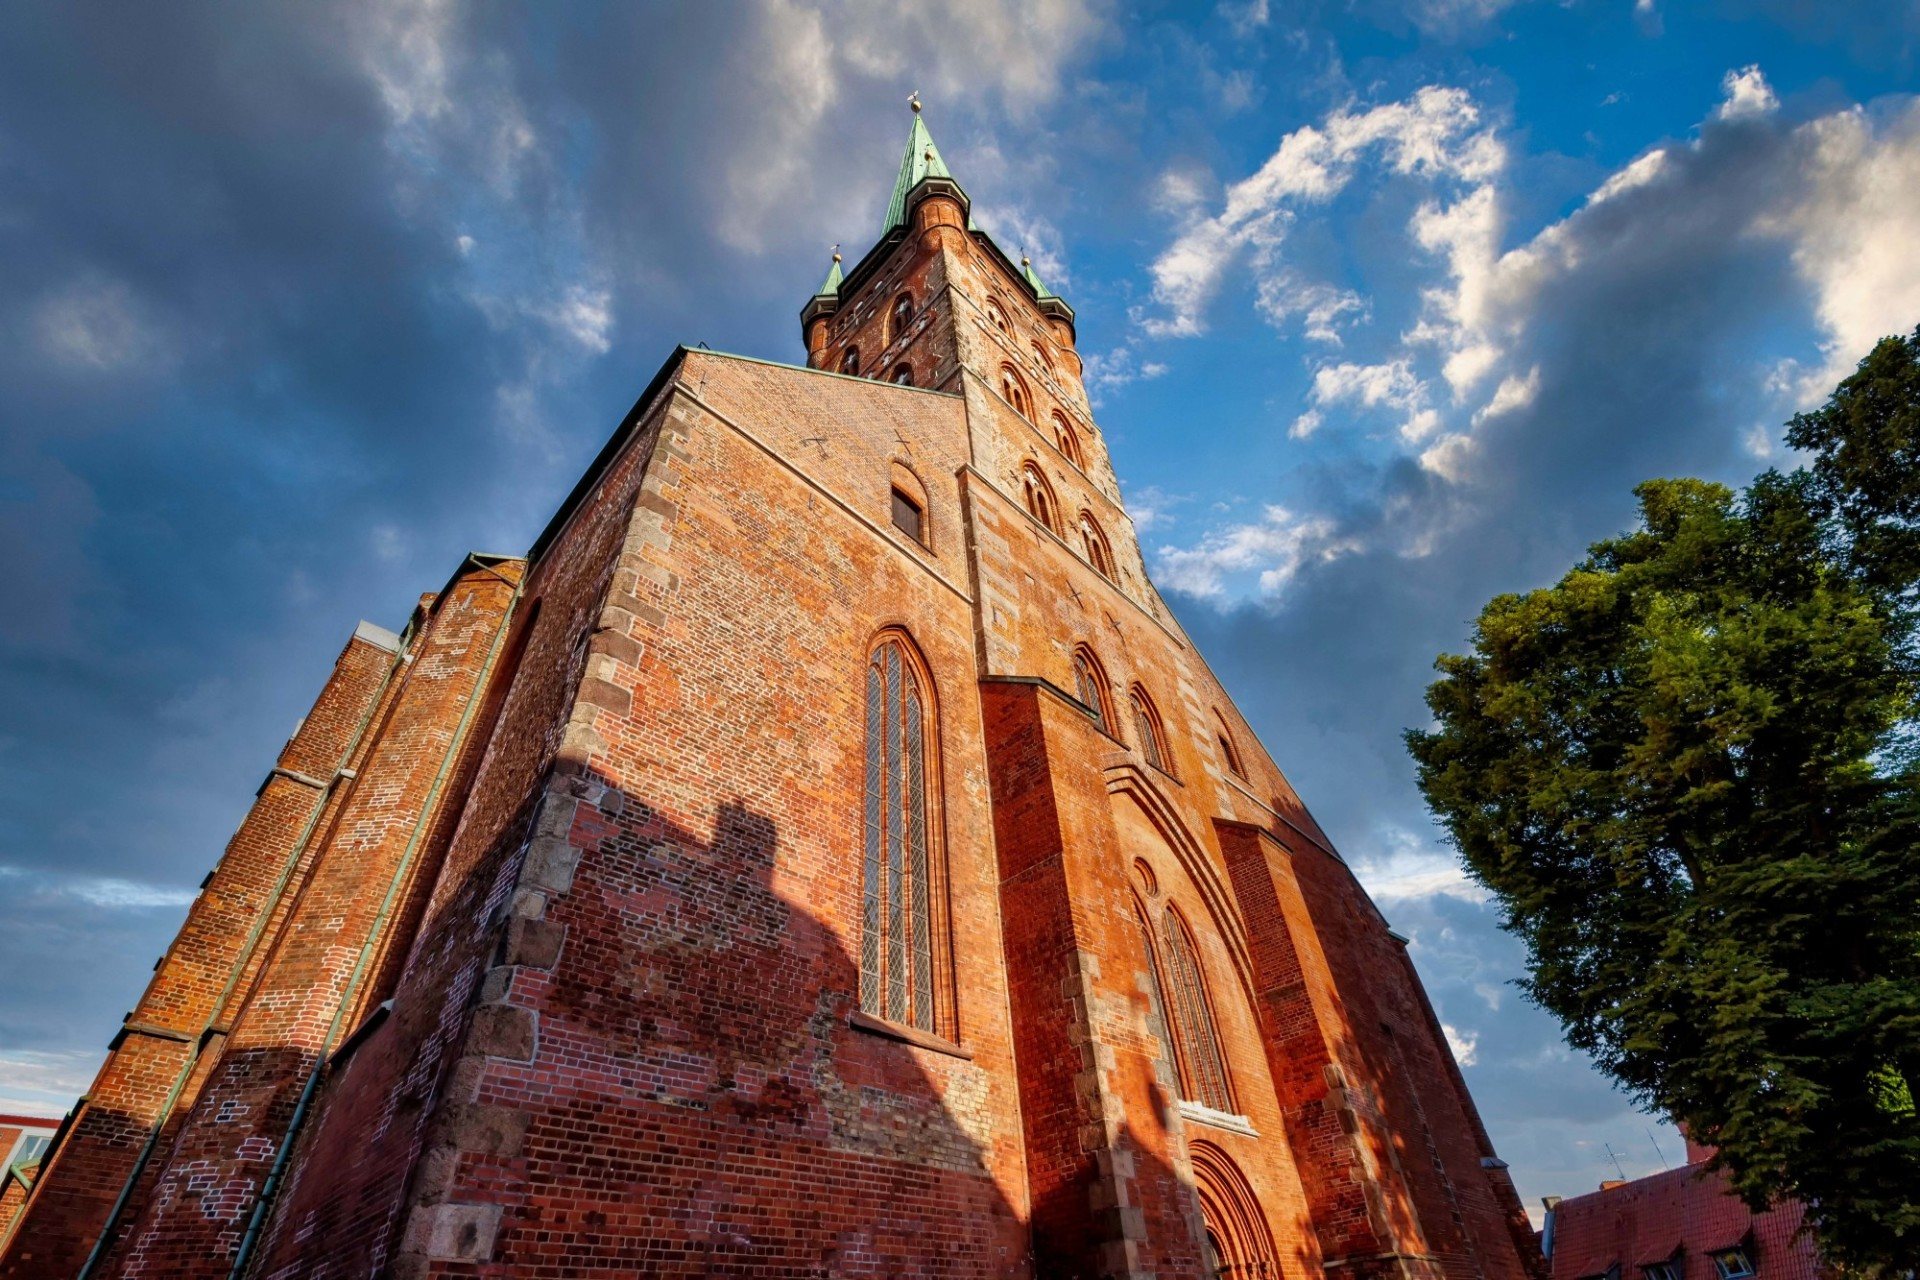 St. Peters Church - Lübeck